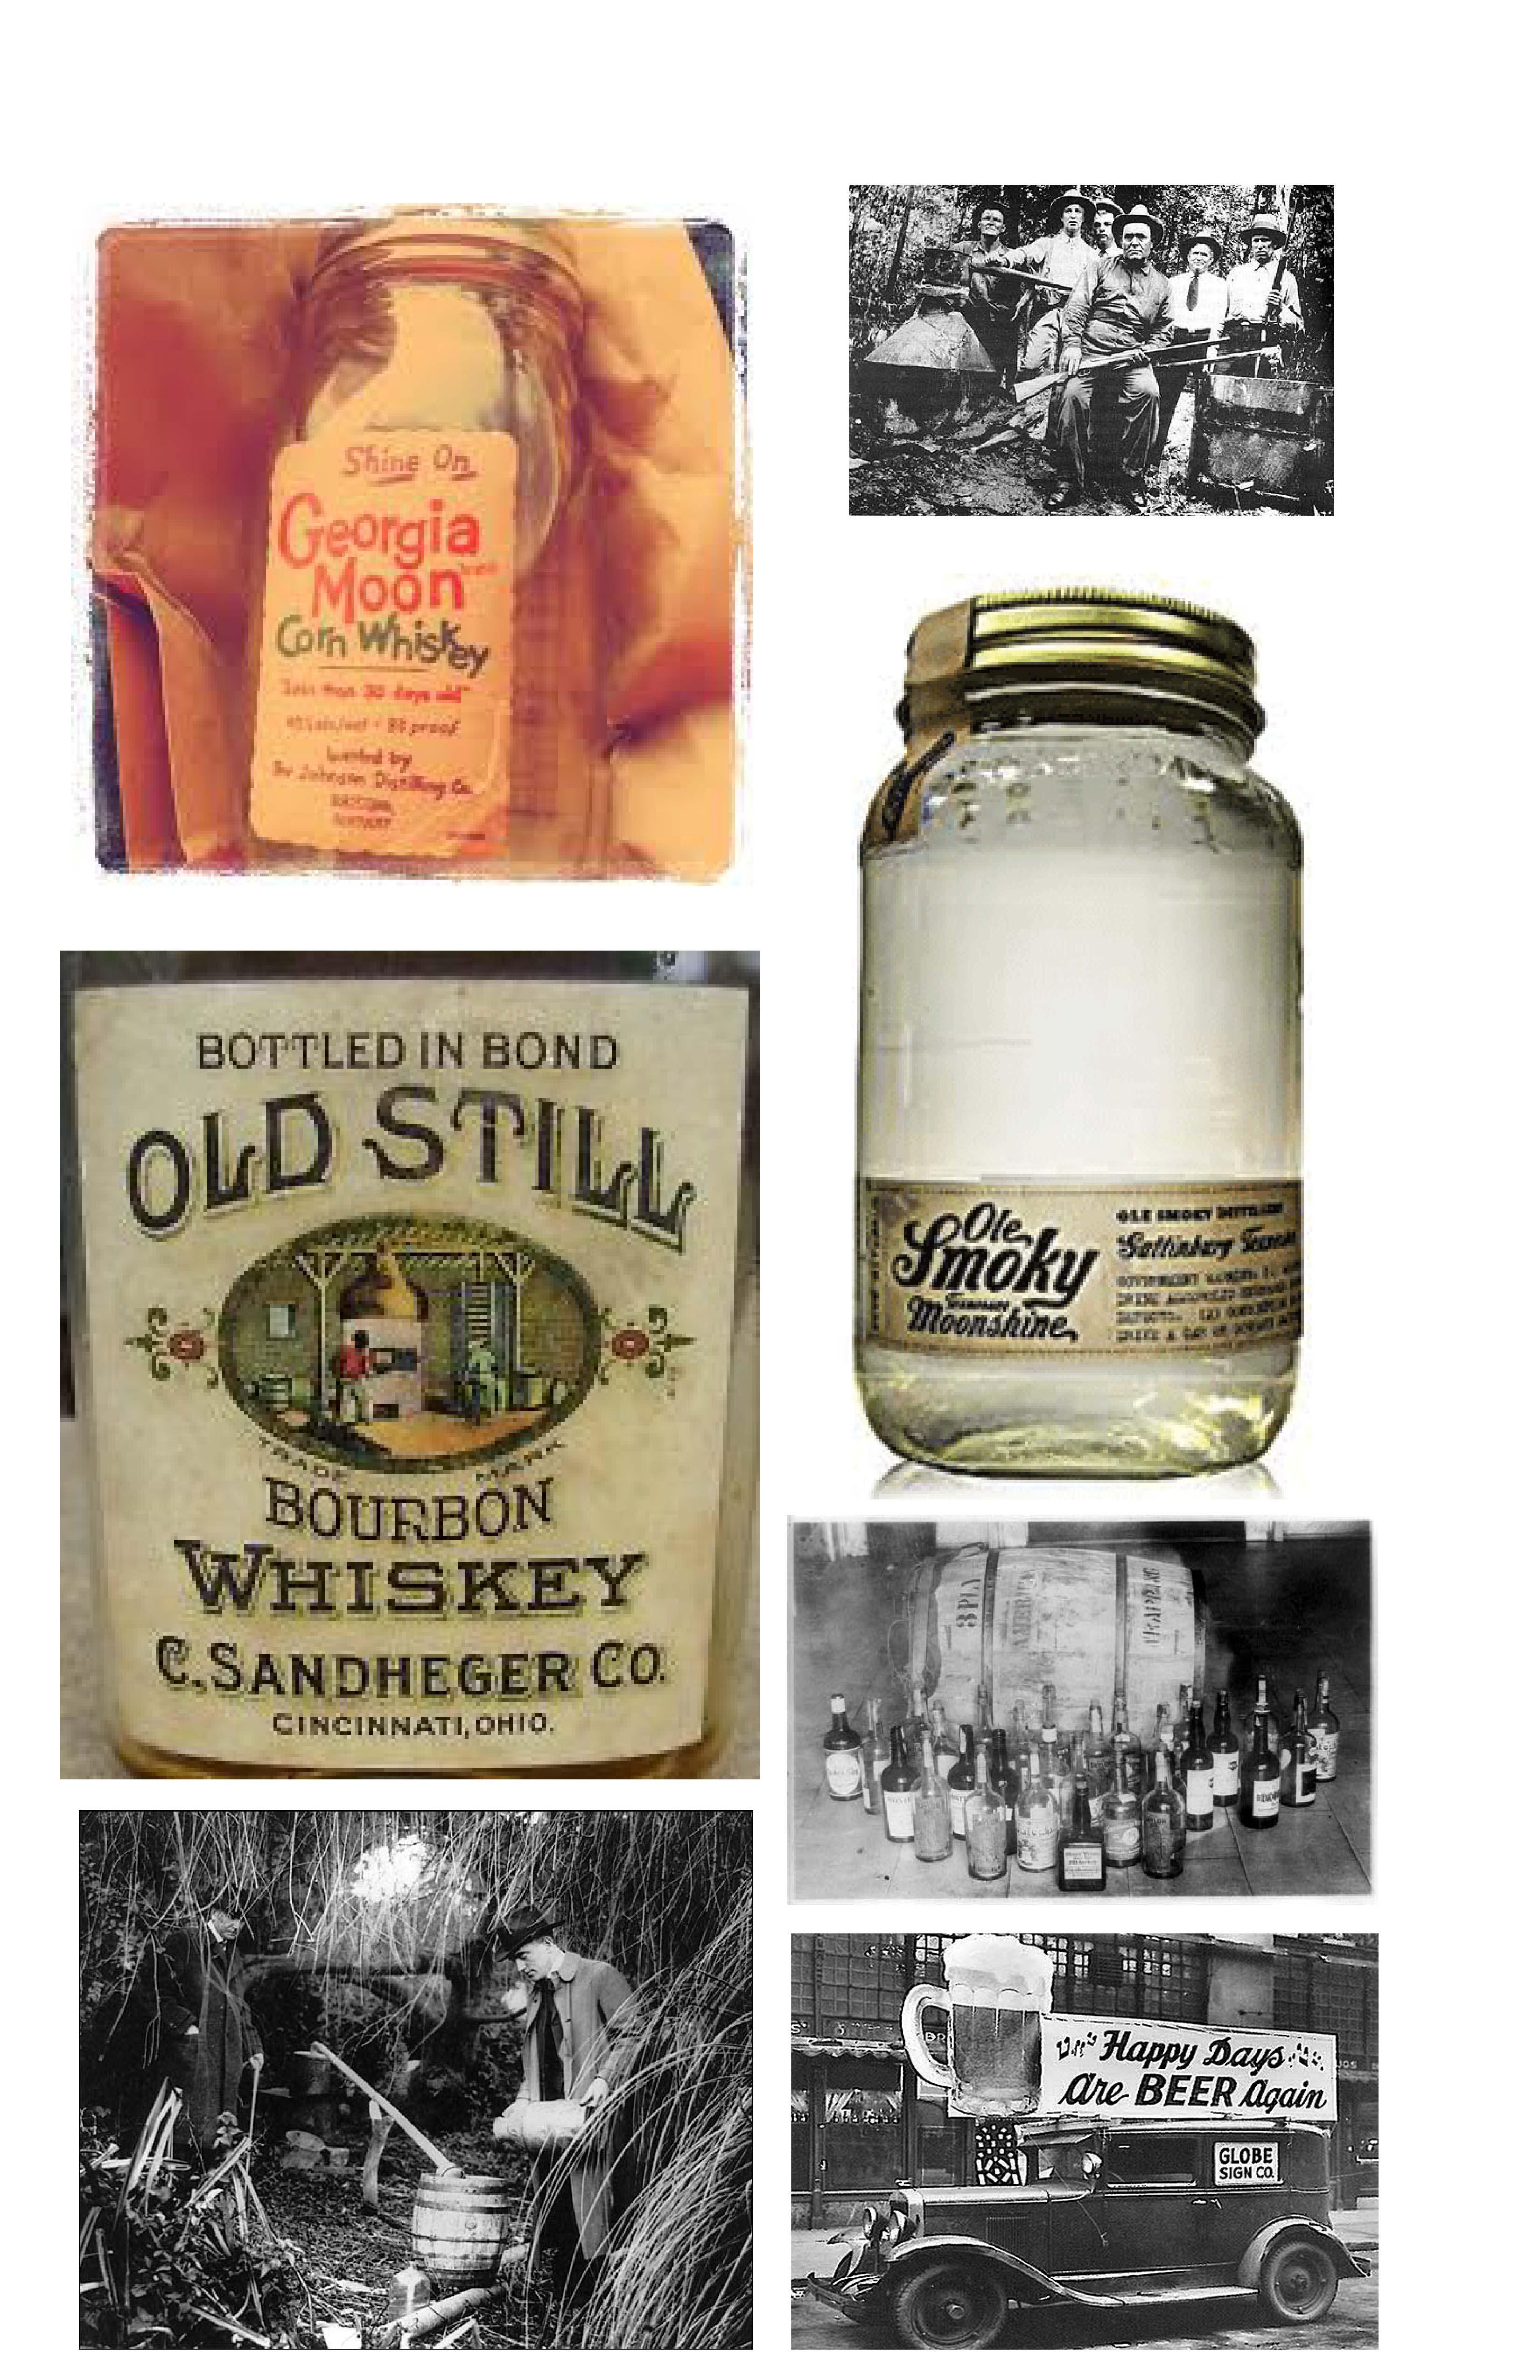 Hooch Moonlight Whiskey - image 3 - student project